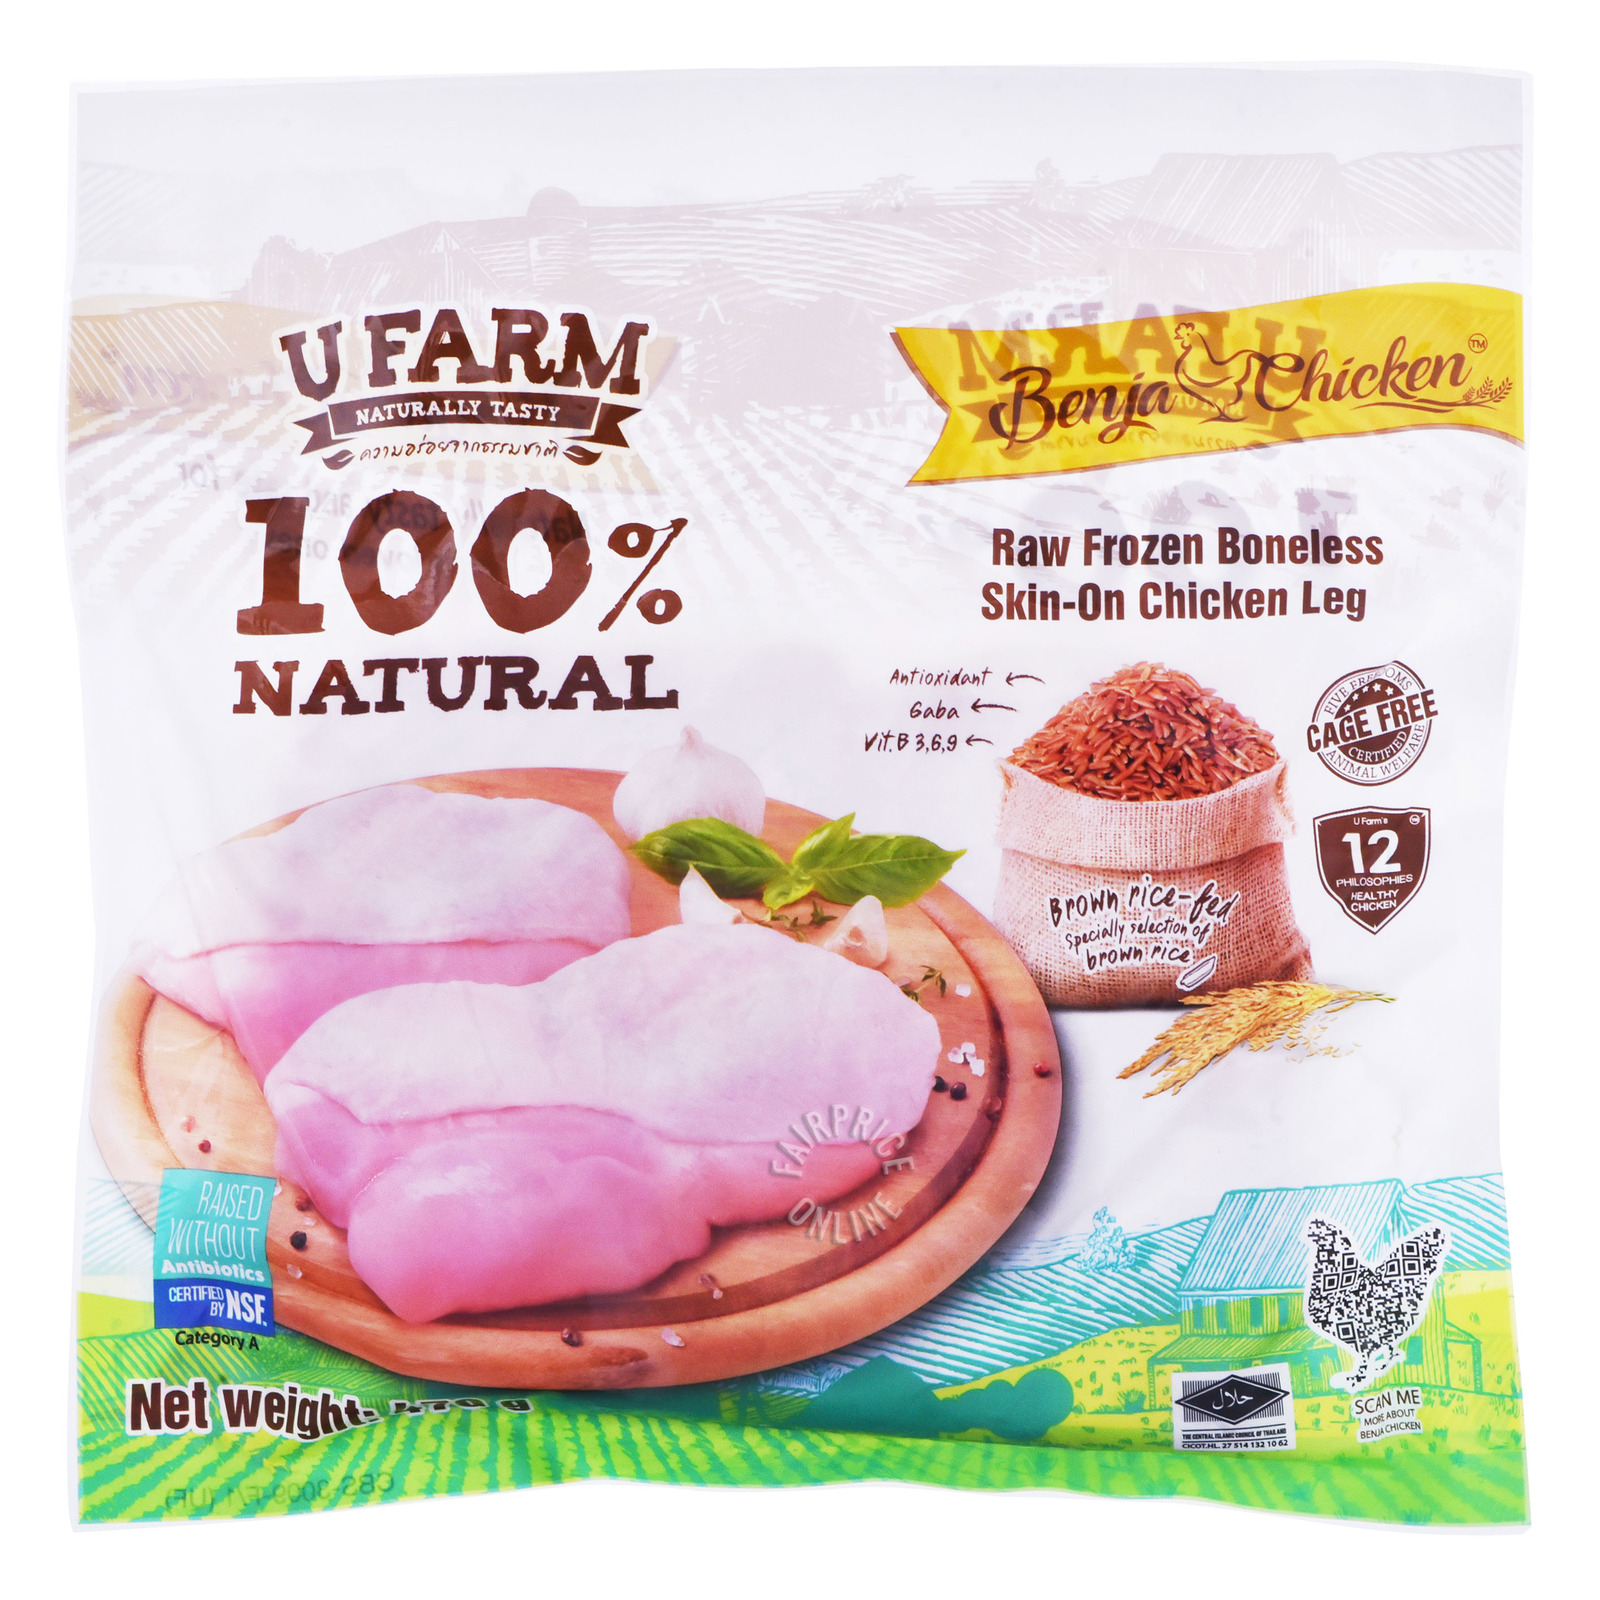 U Farm Benja Frozen Raw Boneless Chicken Leg